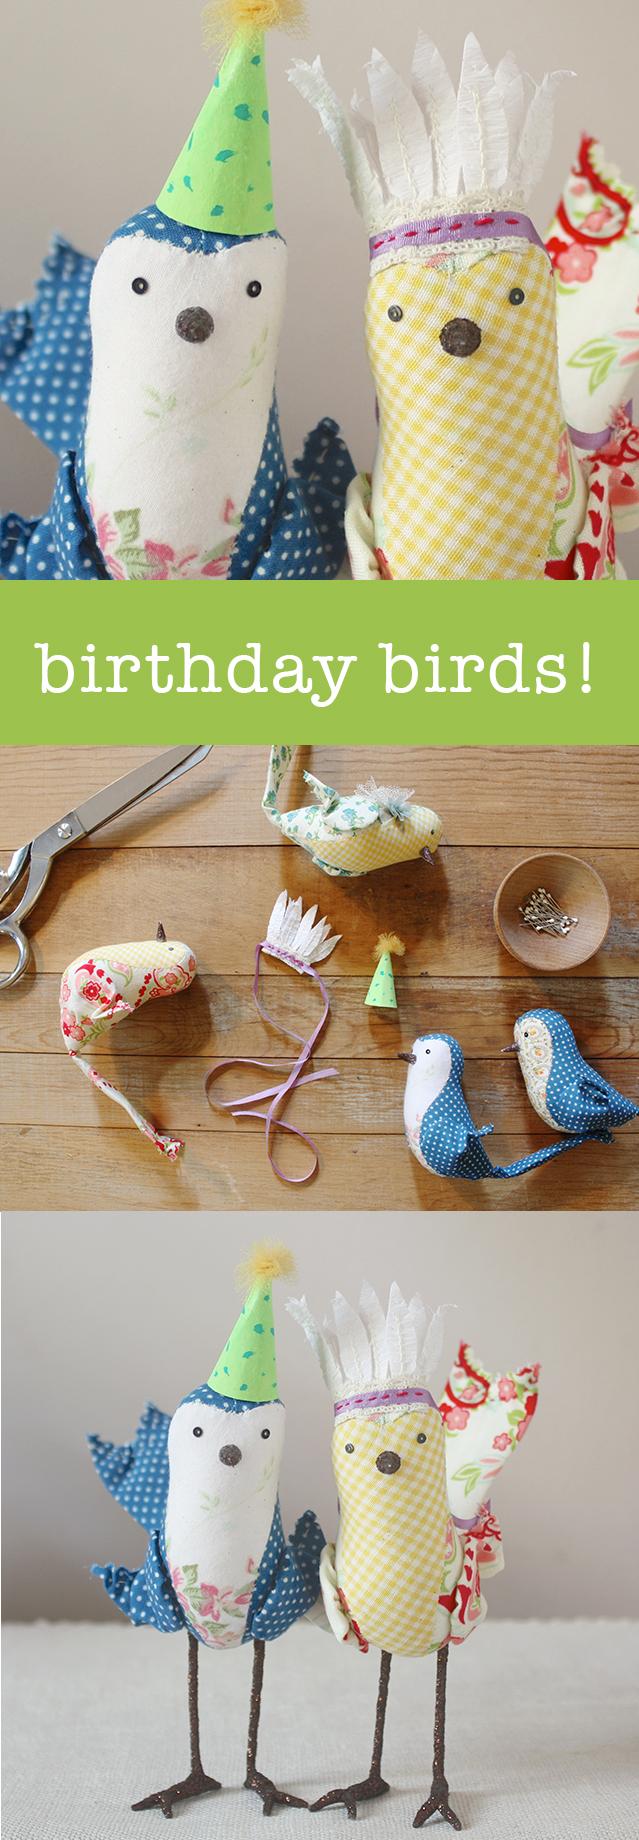 birthday party birds